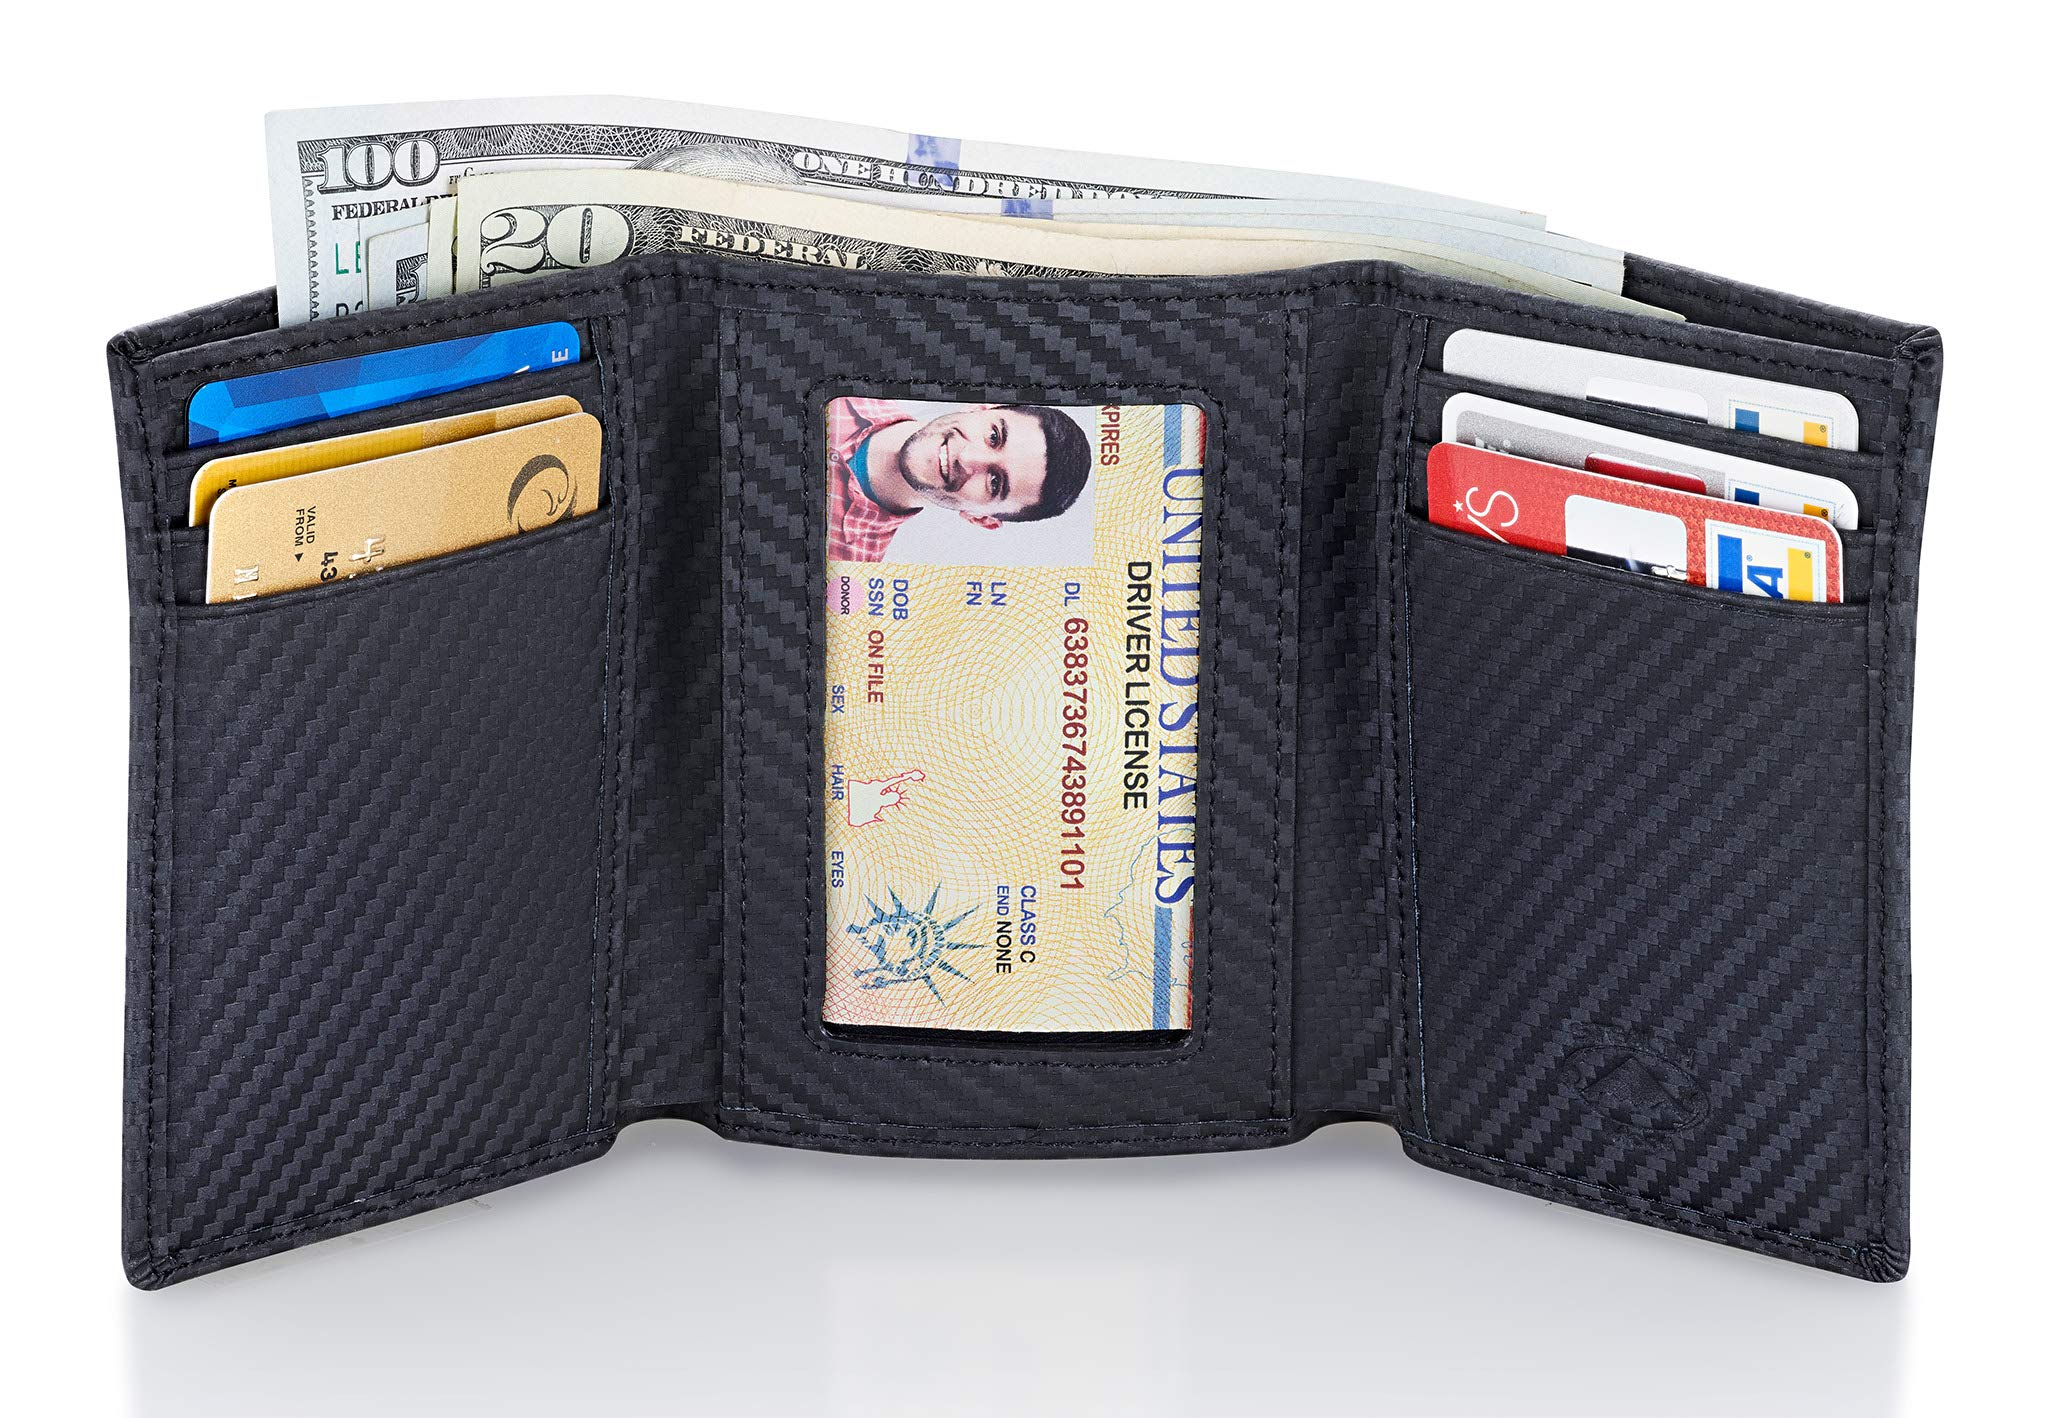 Stealth Mode Trifold RFID Blocking Carbon Fiber Wallet for Men by Stealth Mode (Image #2)